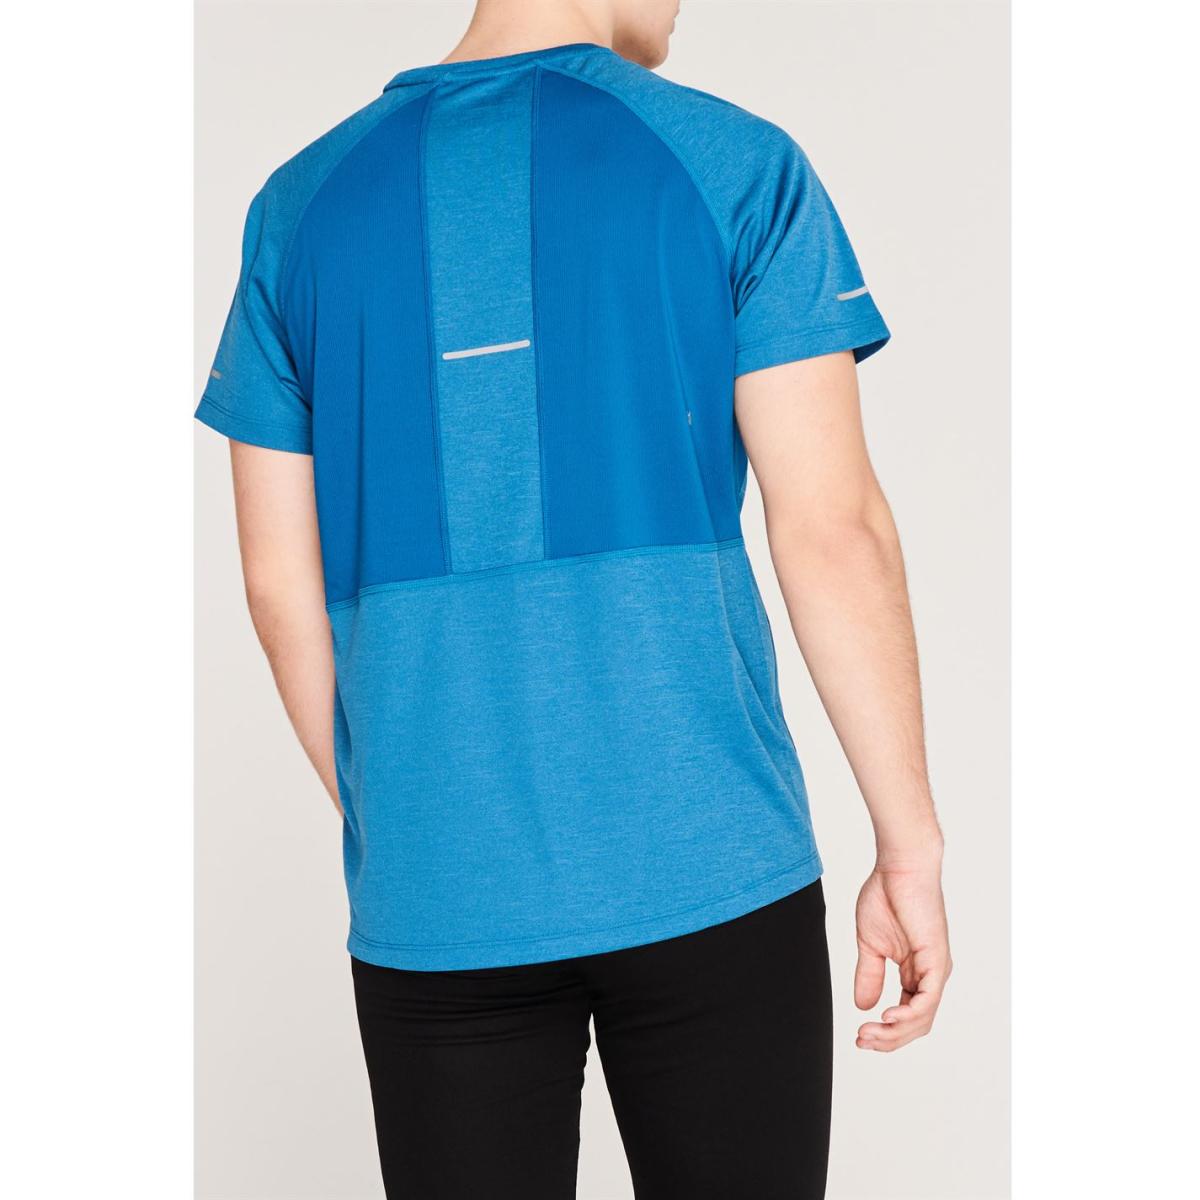 Asics T-Shirt Herren Sportshirt TShirt Kurzarm 1033